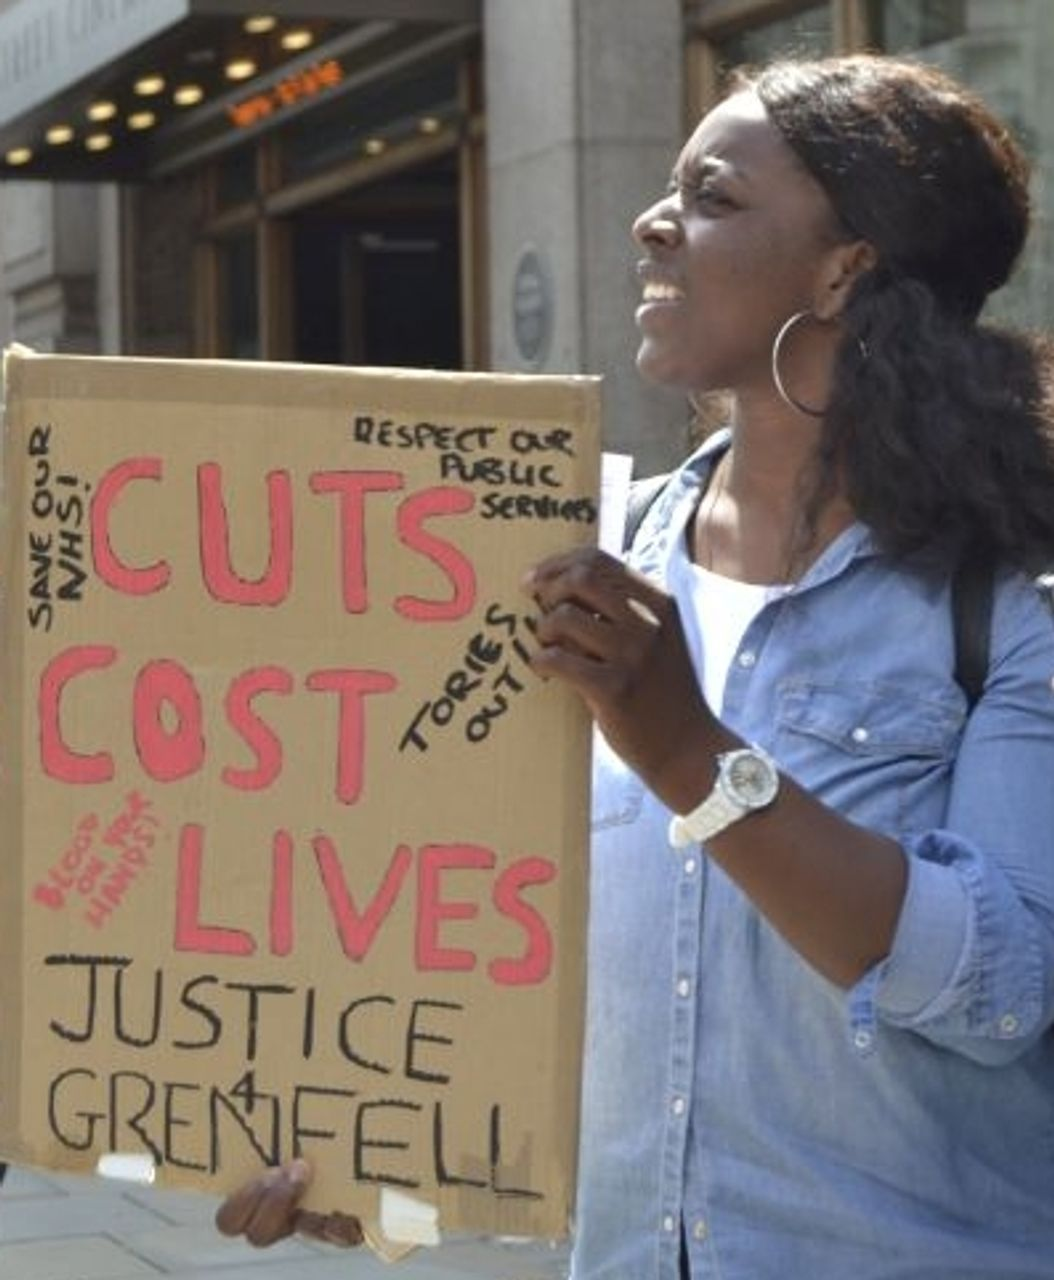 Jacqueline, 1 July London anti-Theresa May demonstrator